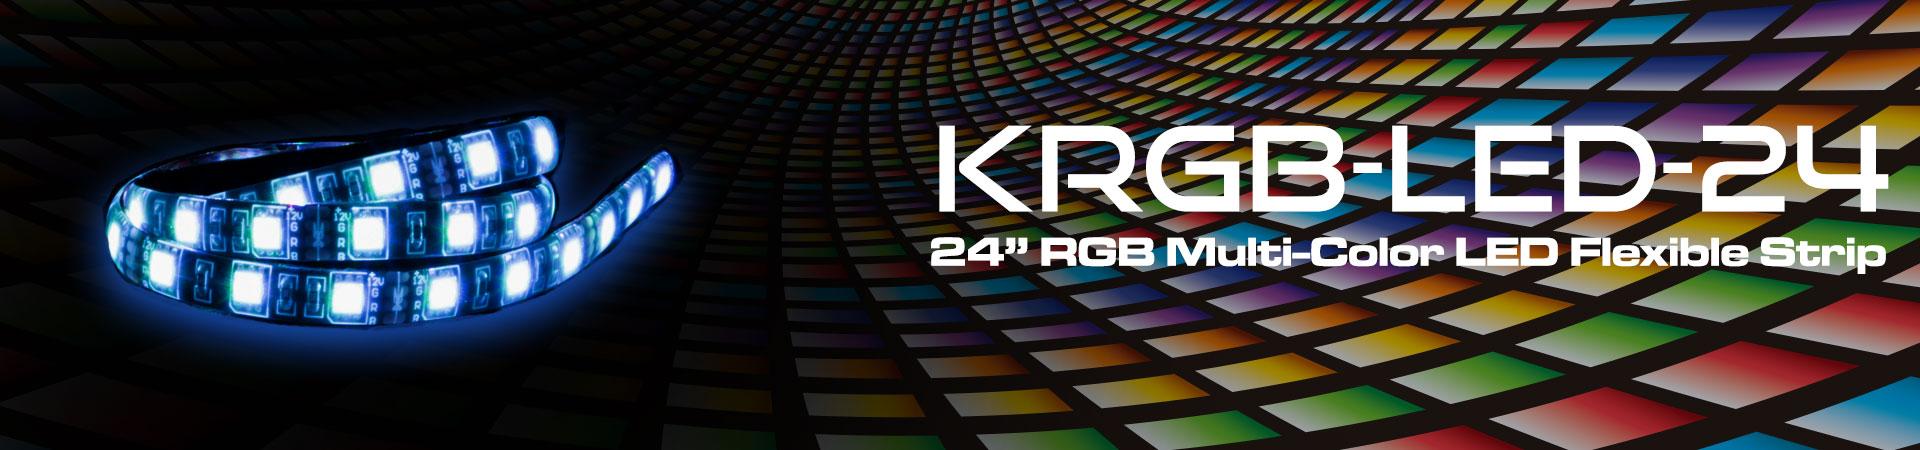 KRGB-LED-24_Banner